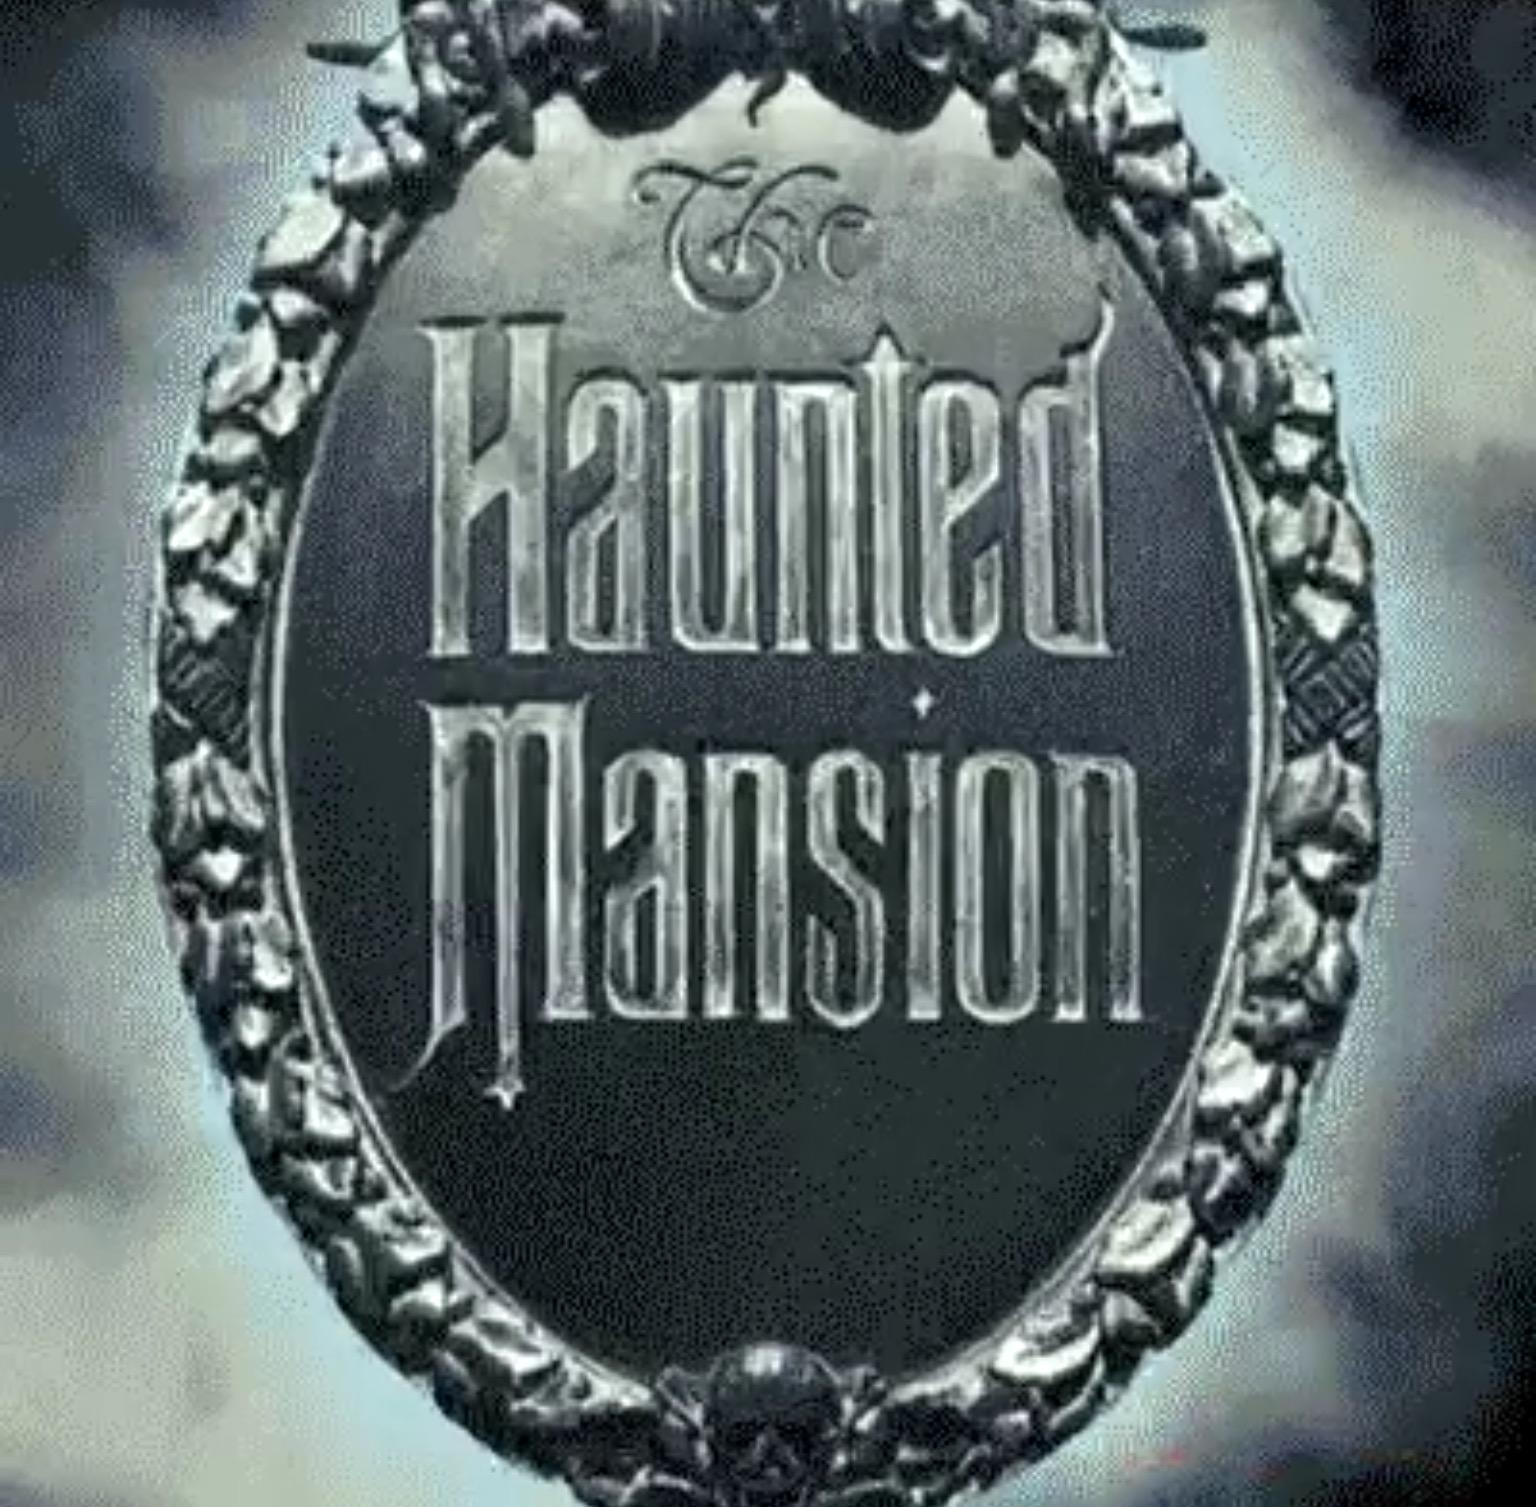 Marvel Tease Disney Kingdom Haunted Mansion Comic Book